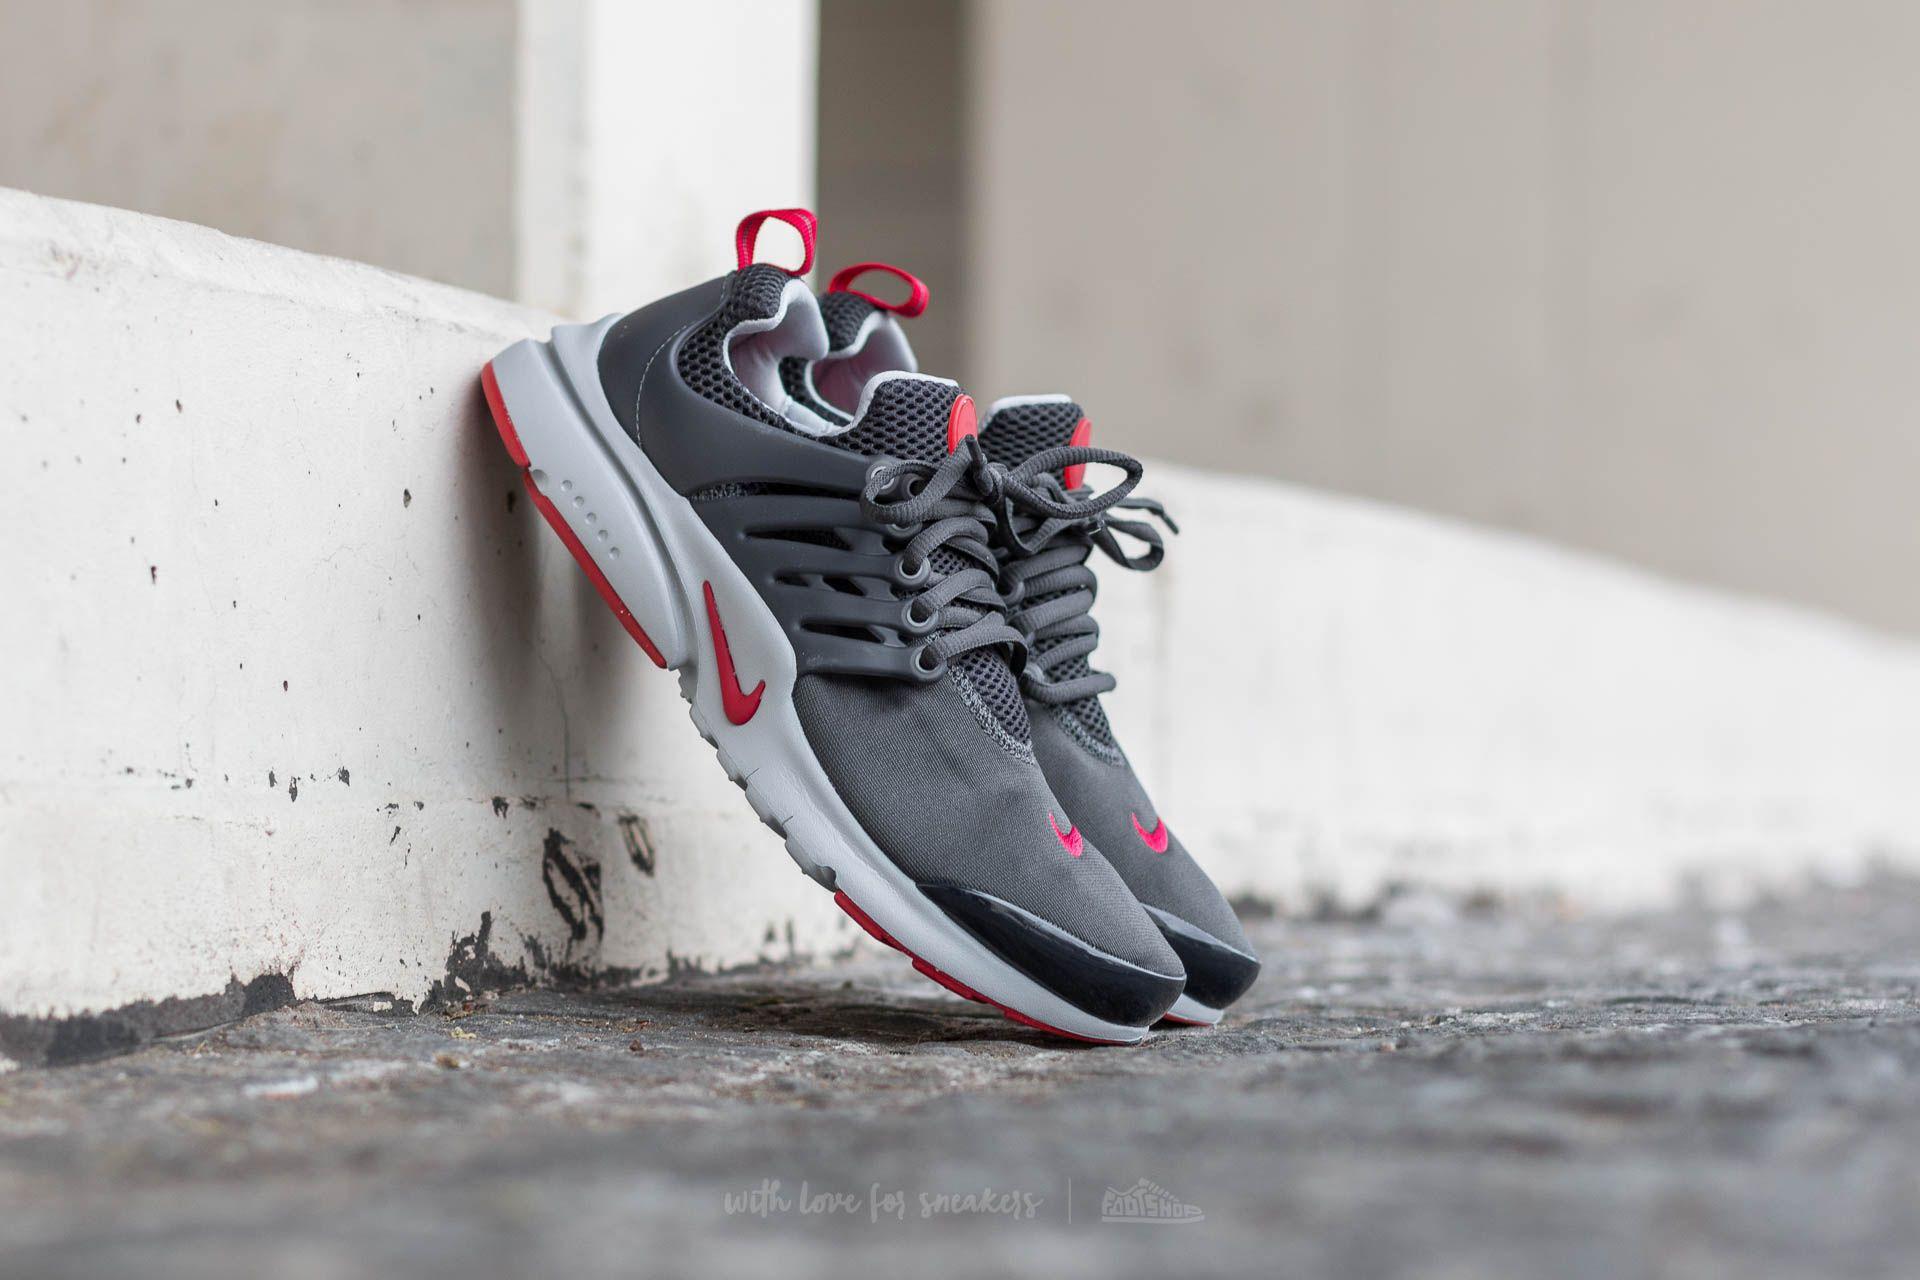 Nike Air Max 1 Premium Gym Red Anthracite